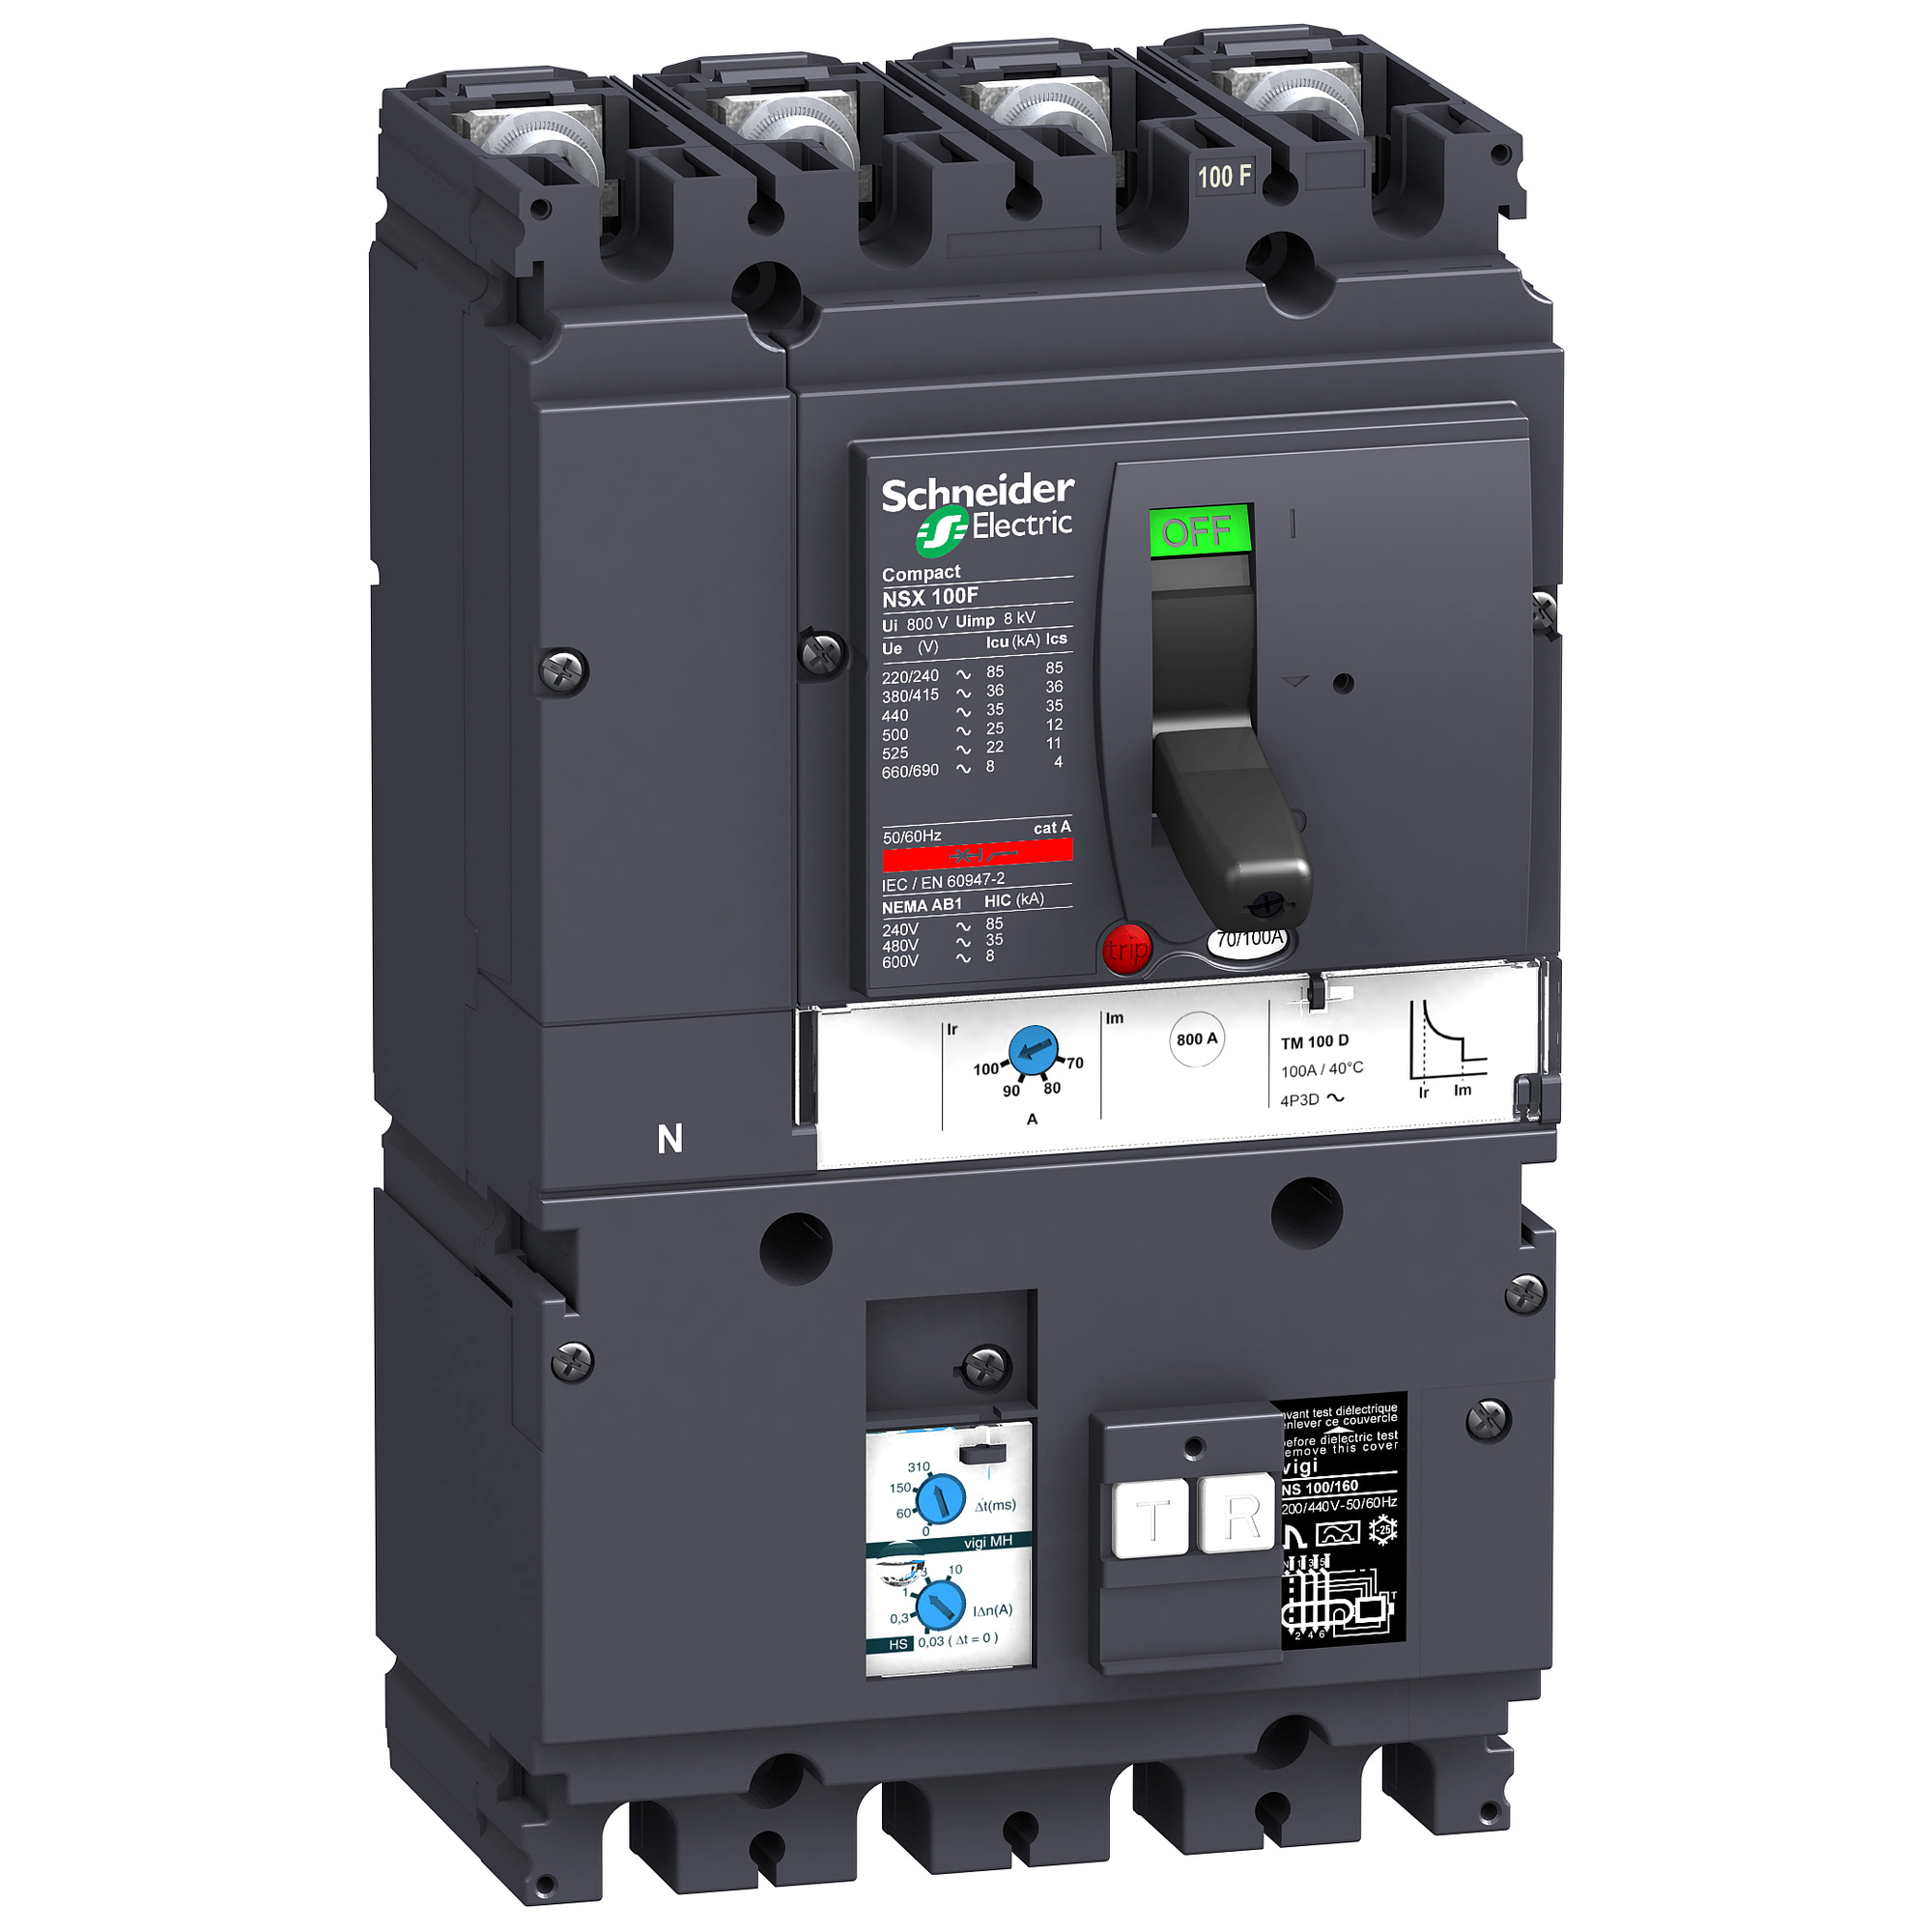 Image Description for https://tedi.itc-electronics.com/itcmedia/images/20190424/LV429941_SCHNEIDERELECTRIC_1.jpeg